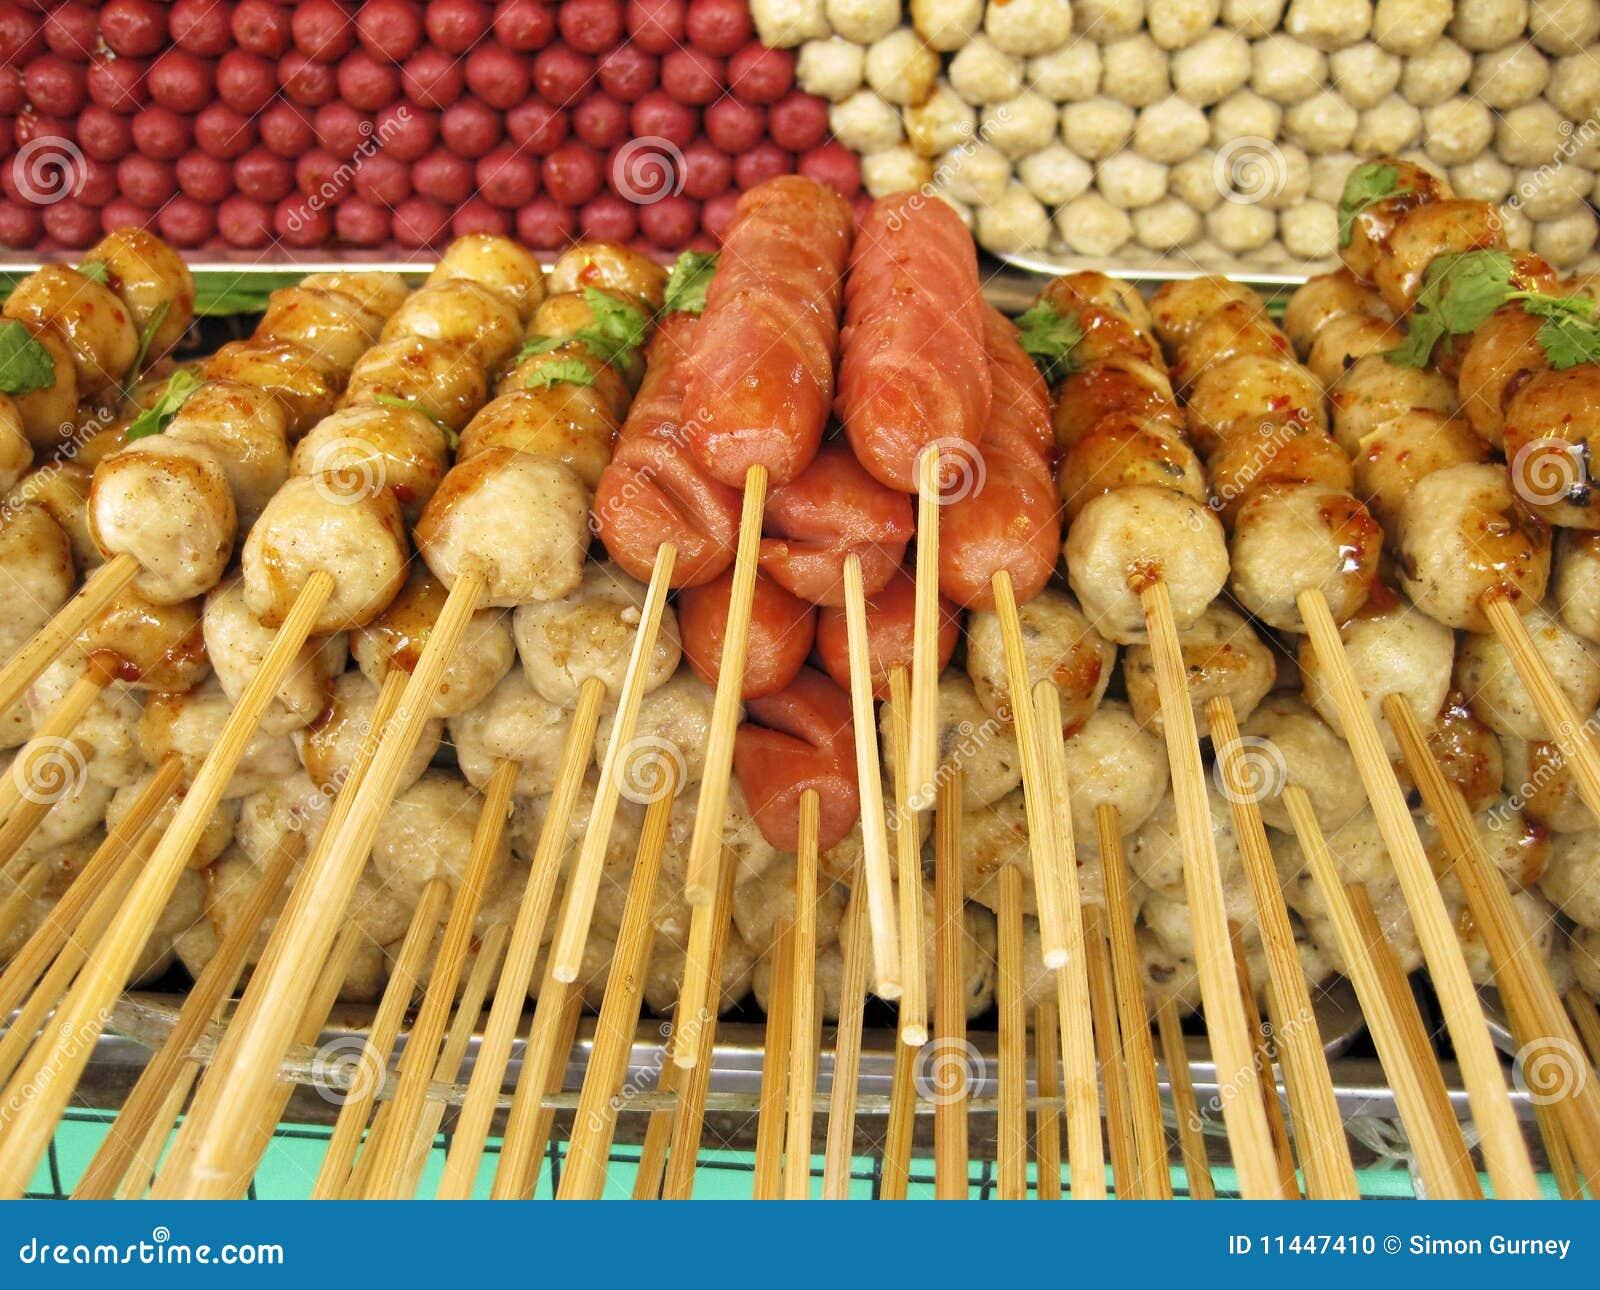 asian snack food market